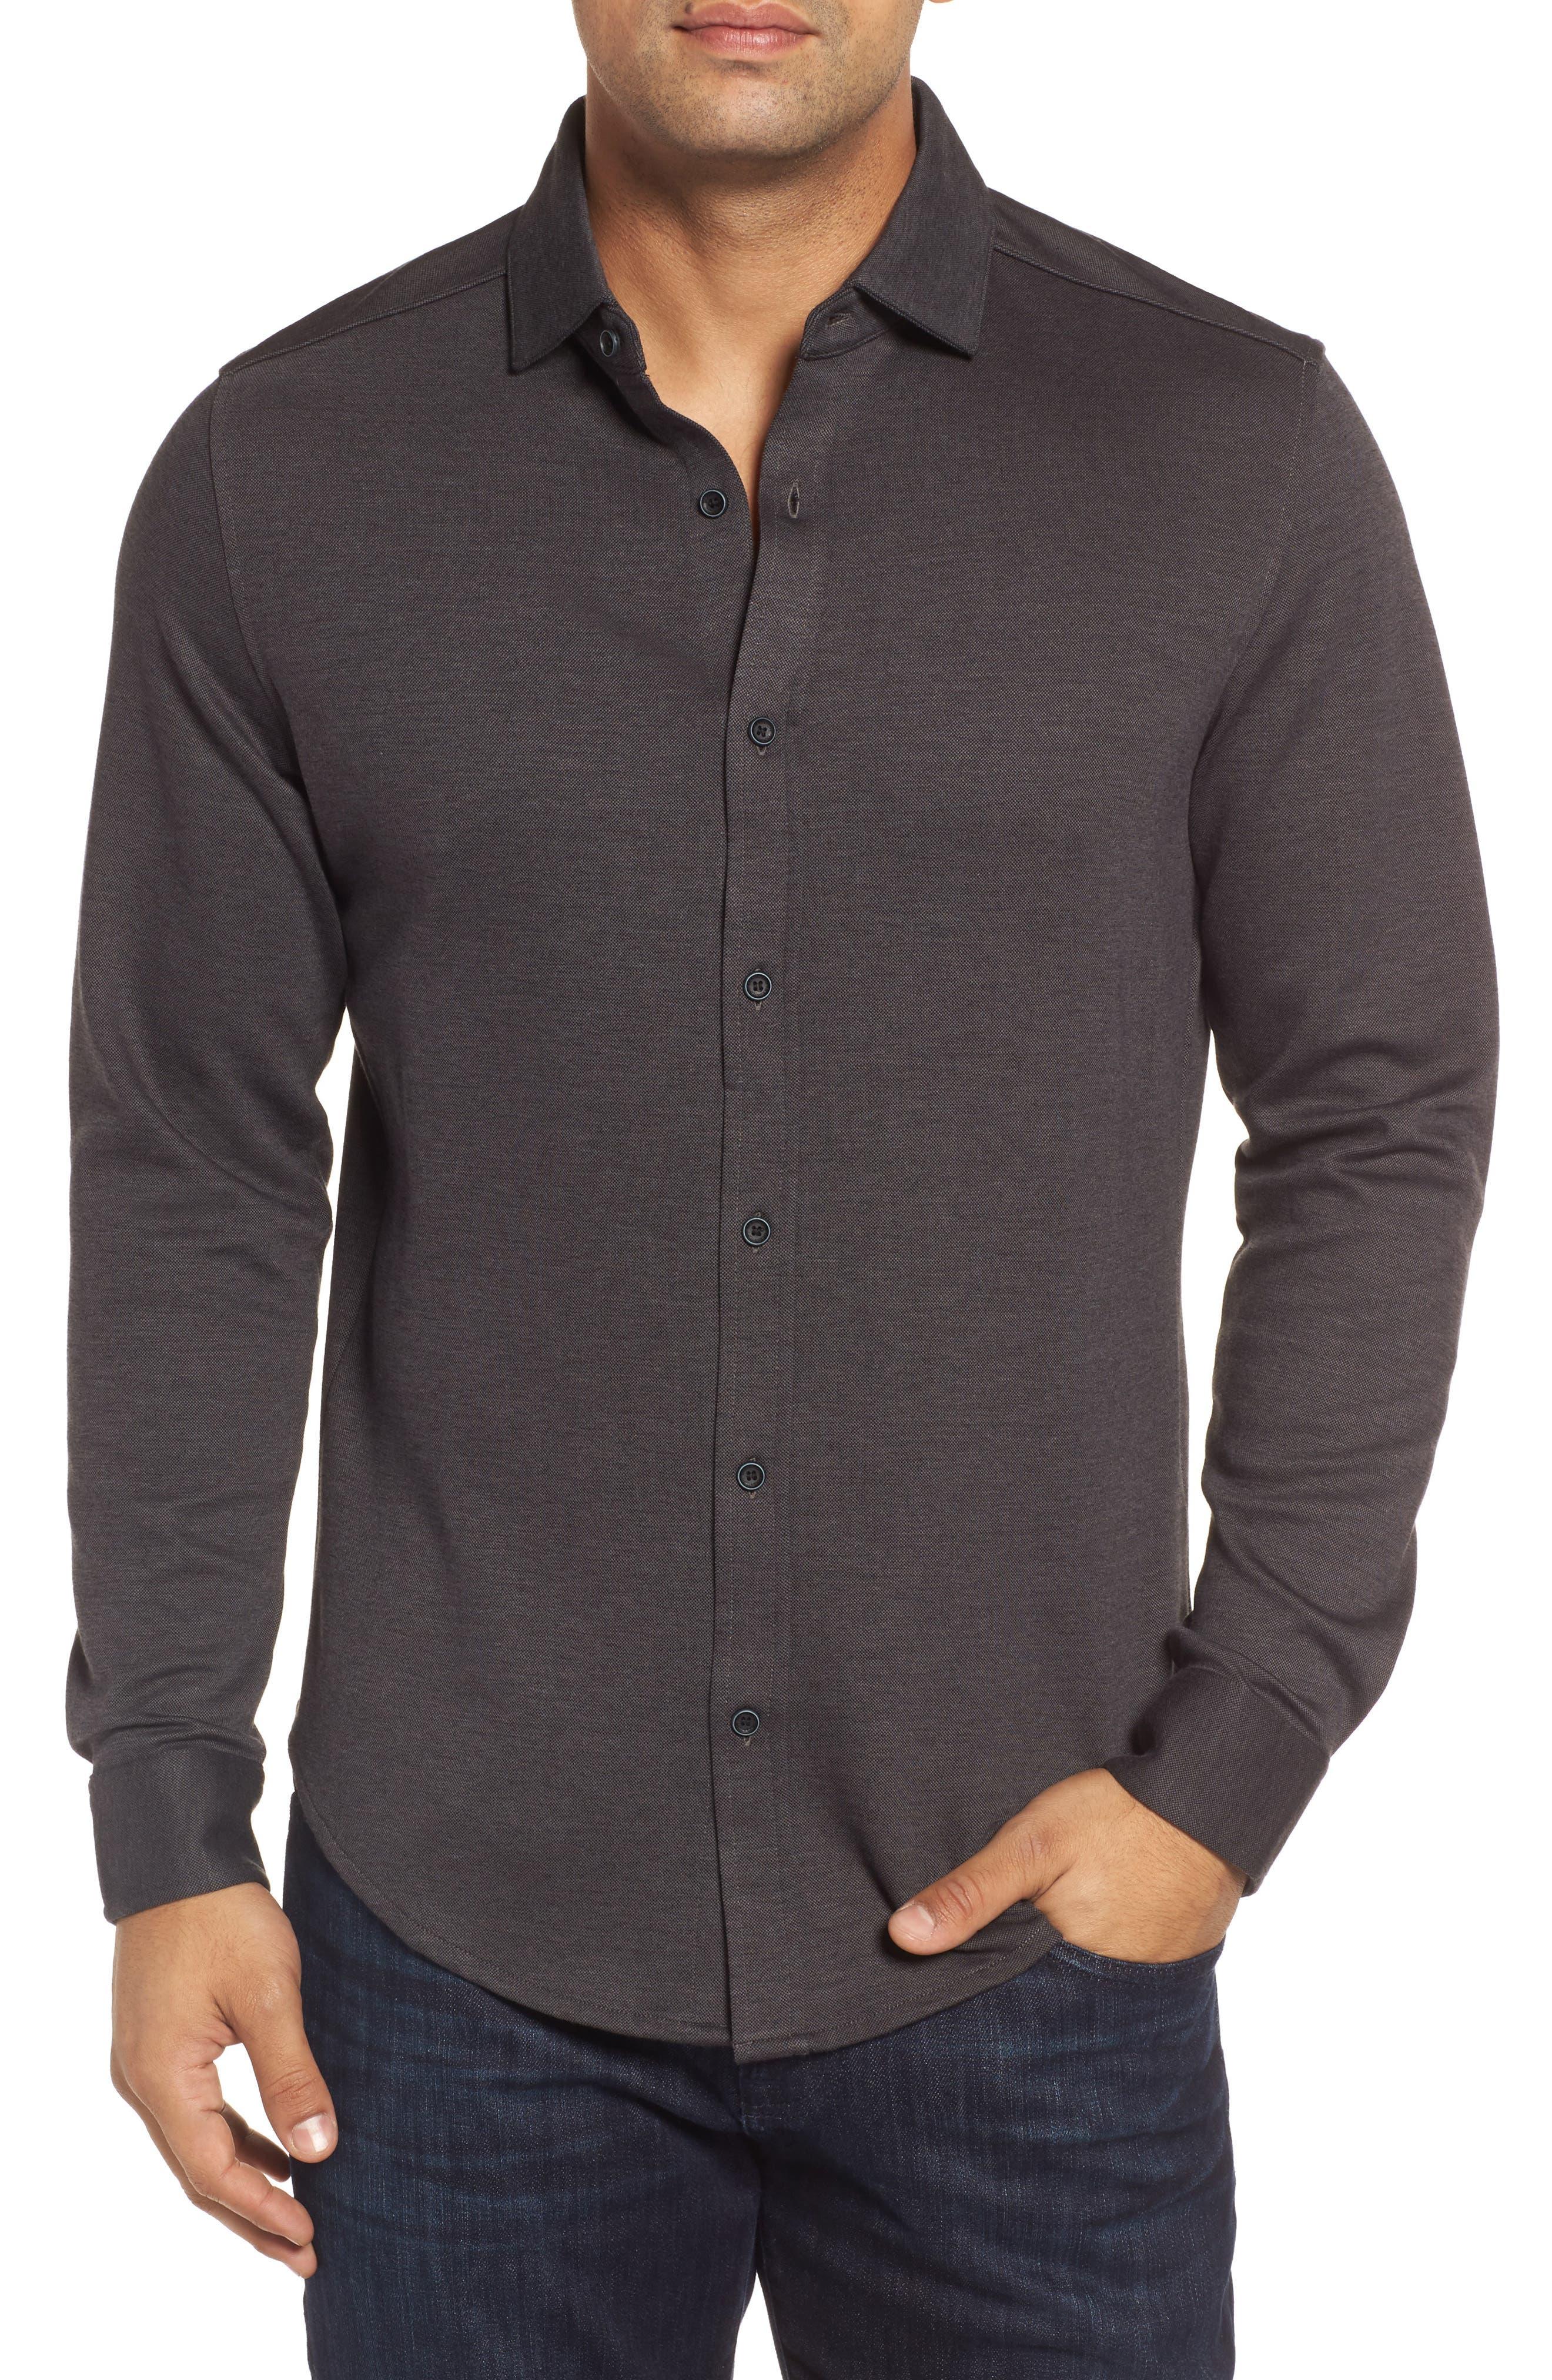 Alternate Image 1 Selected - Bugatchi Classic Fit Heathered Knit Sport Shirt